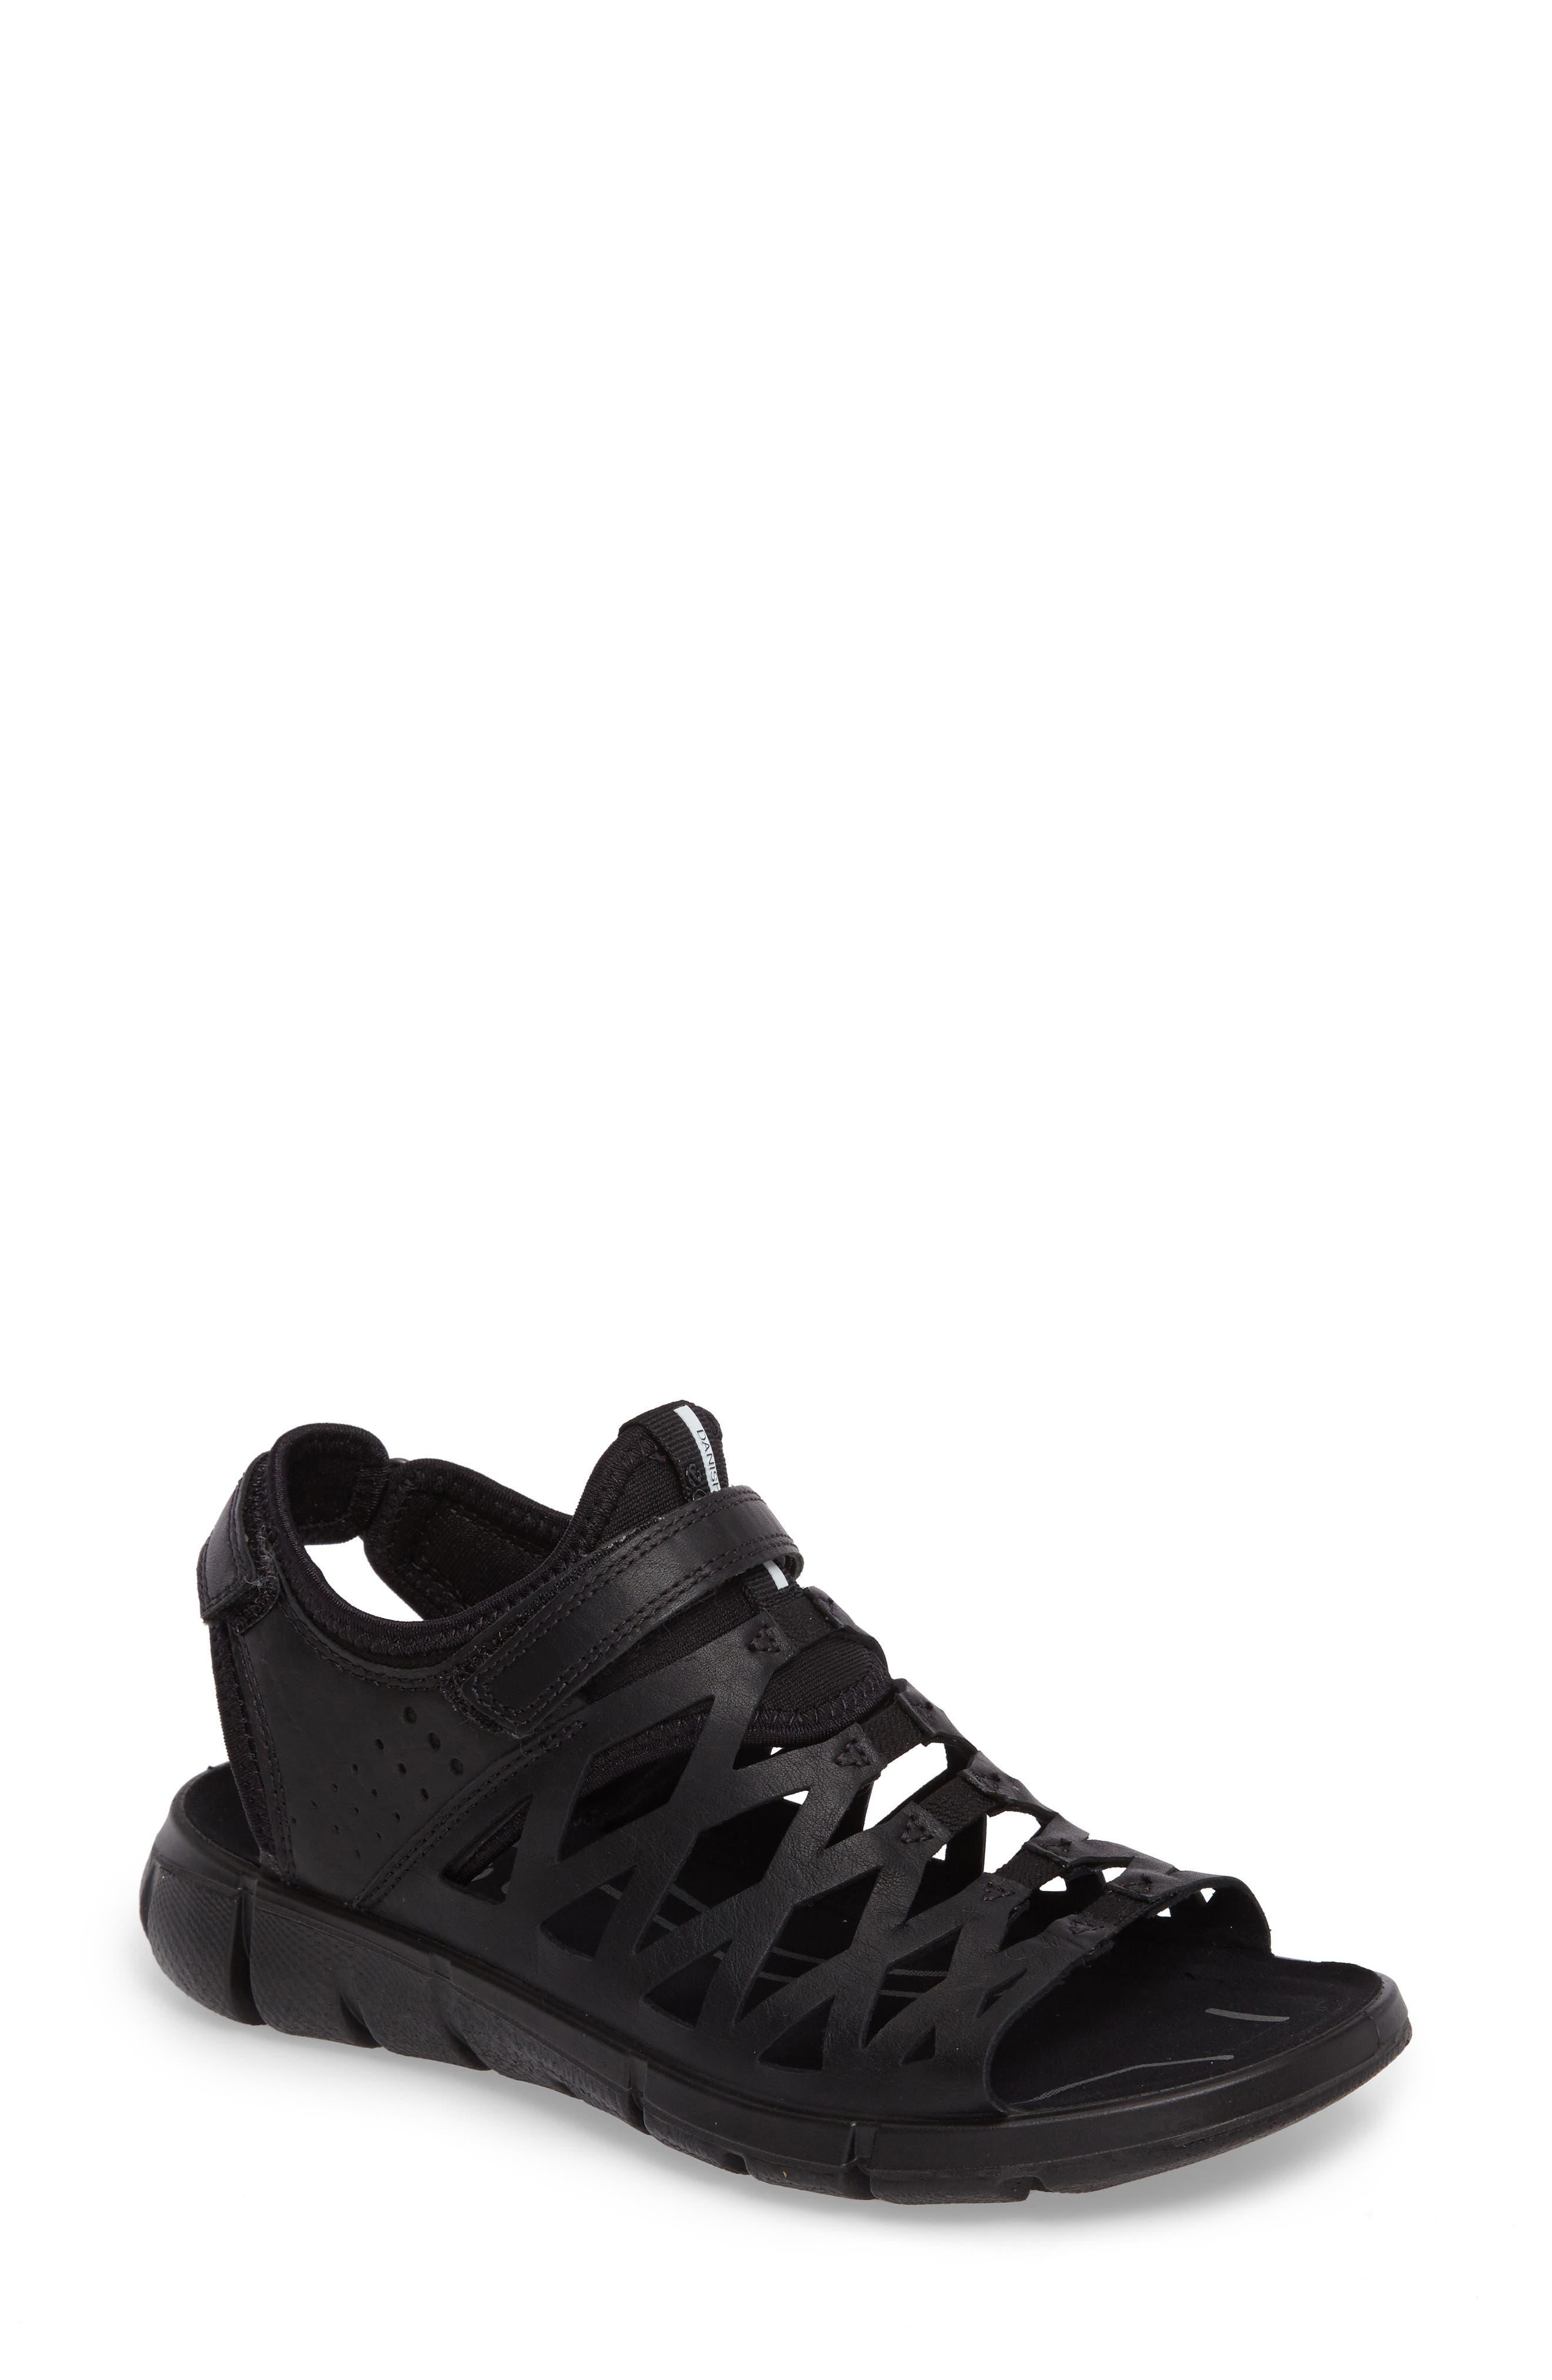 Alternate Image 1 Selected - ECCO Intrinsic 2 Sandal (Women)